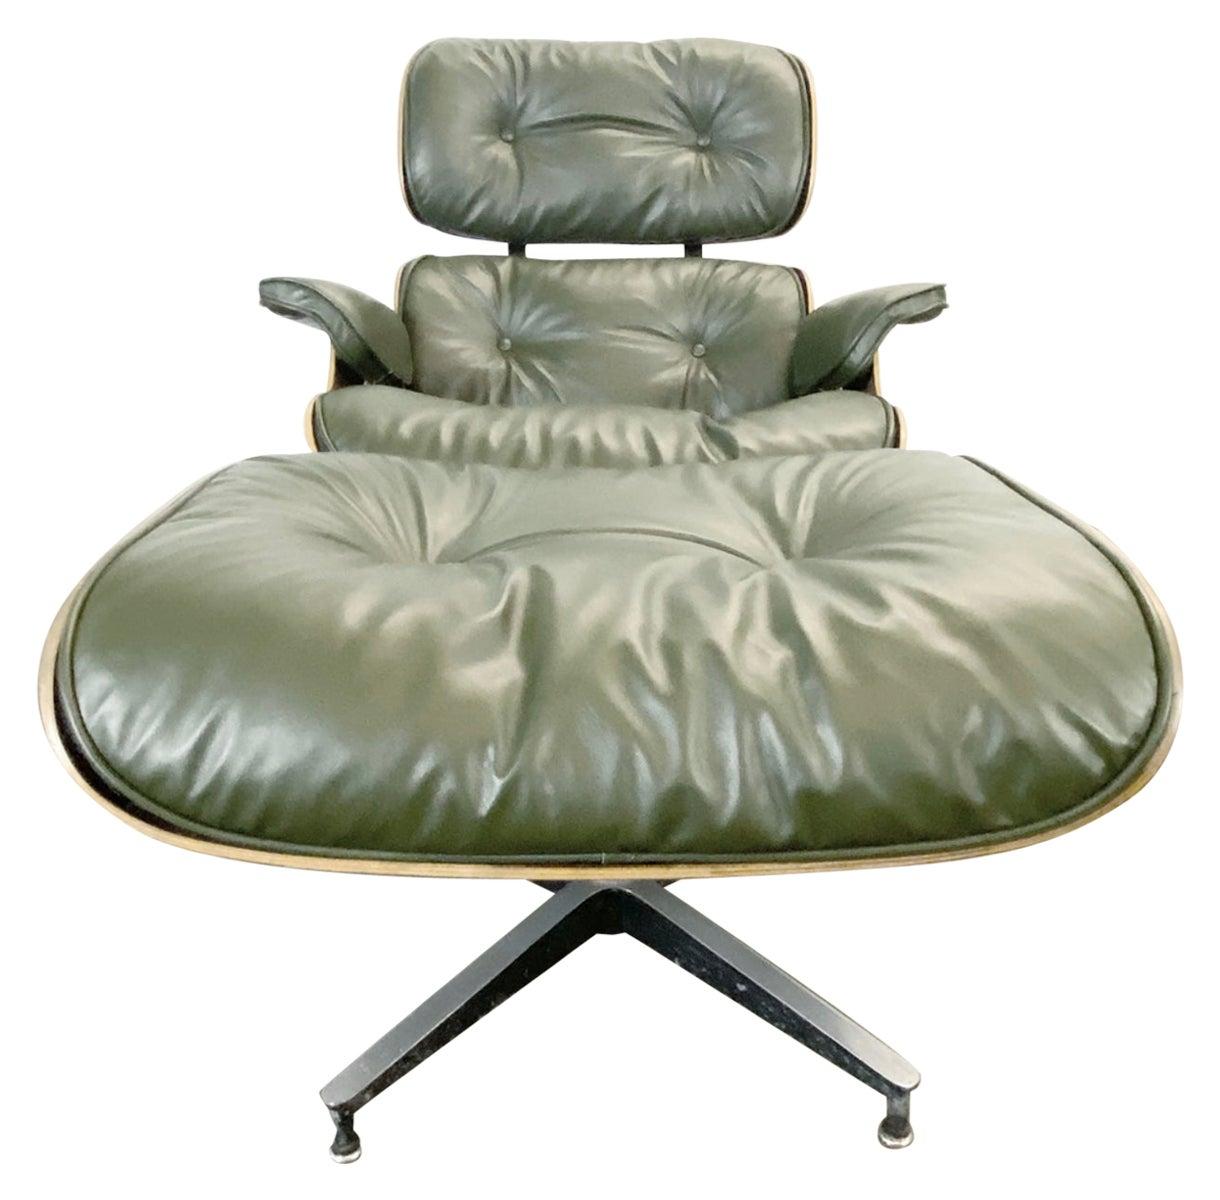 Gorgeous Avocado Eames Lounge Chair and Ottoman